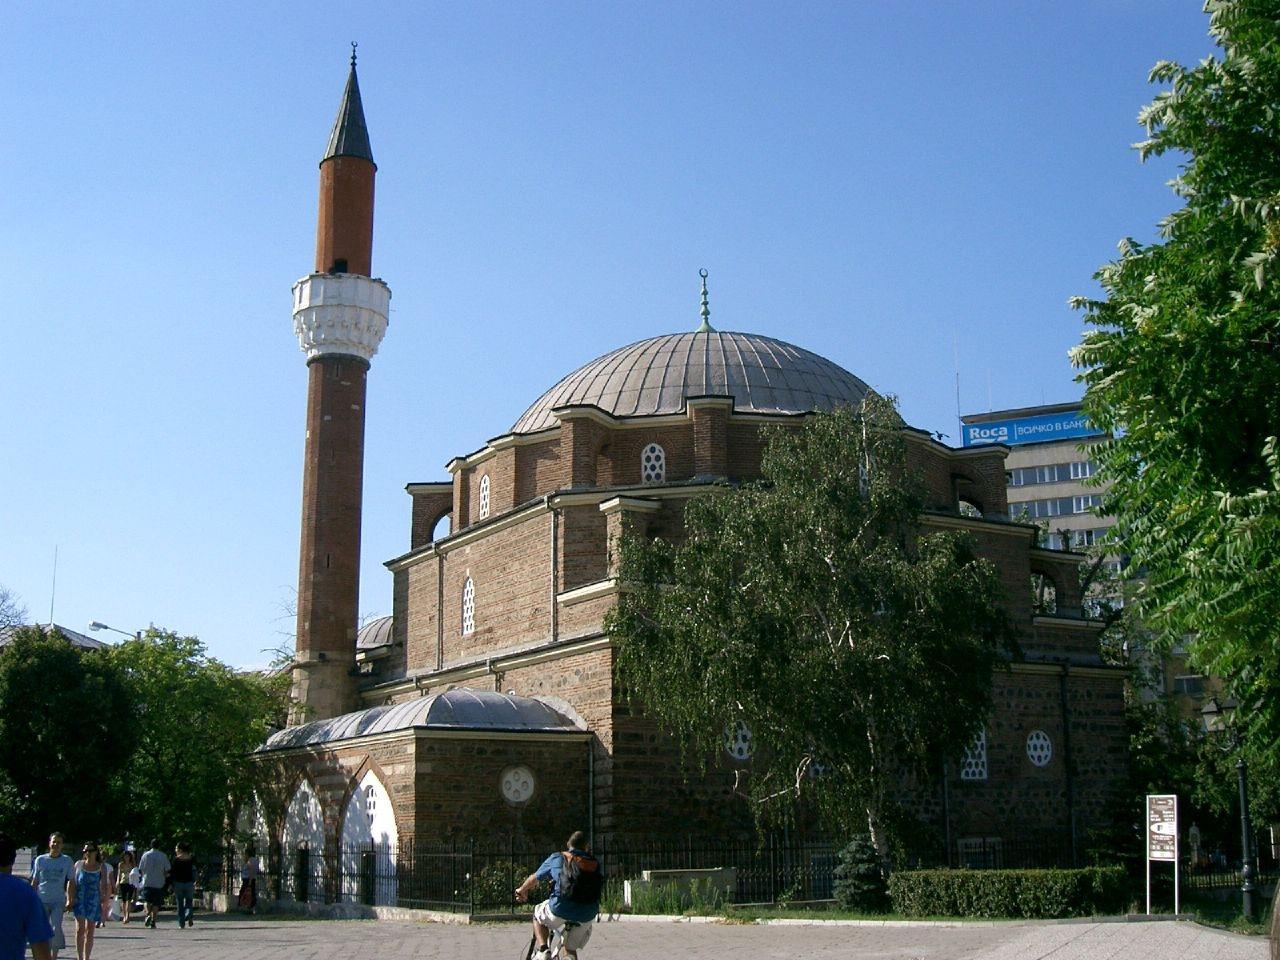 New Zealand Mosque Wikipedia: Masjid E Sofia, Check Out Masjid E Sofia : CnTRAVEL